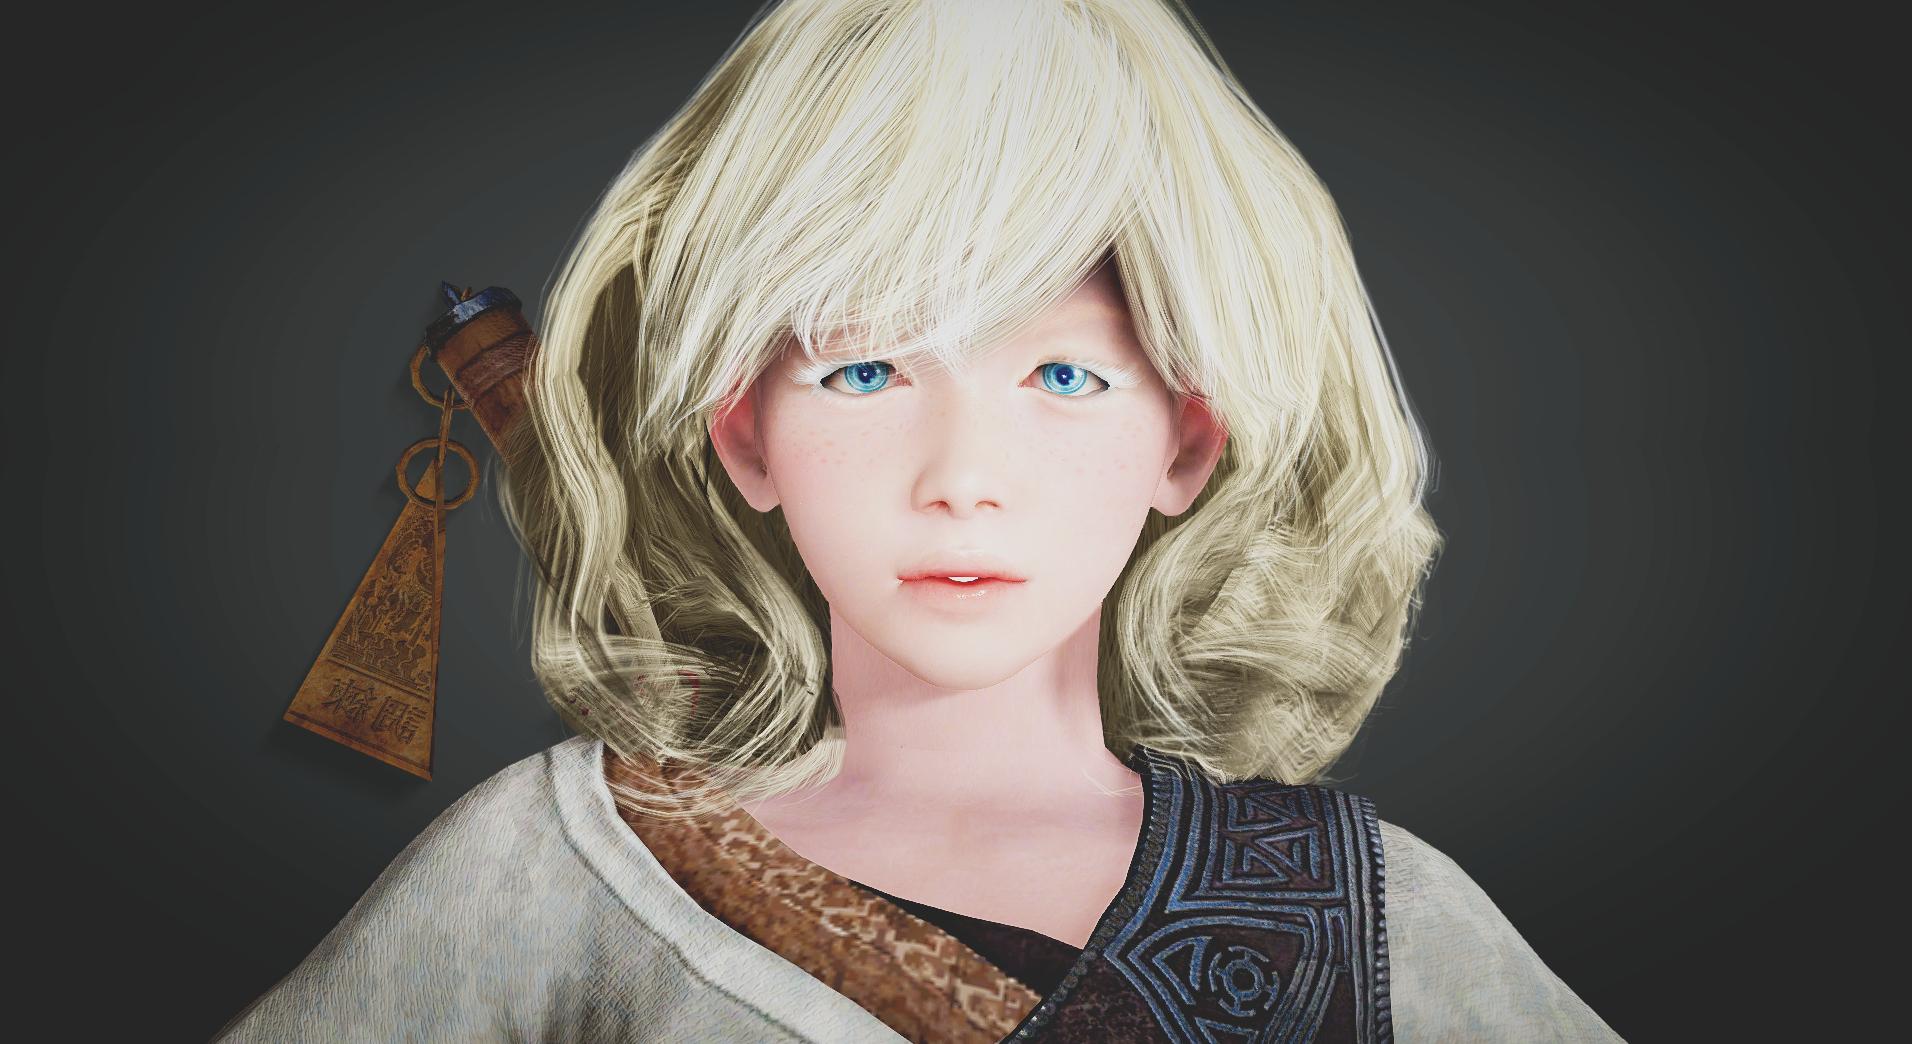 Face Video Games Model Portrait Long Hair Blue Eyes Black Desert Fashion  Hair Toy Light Hair